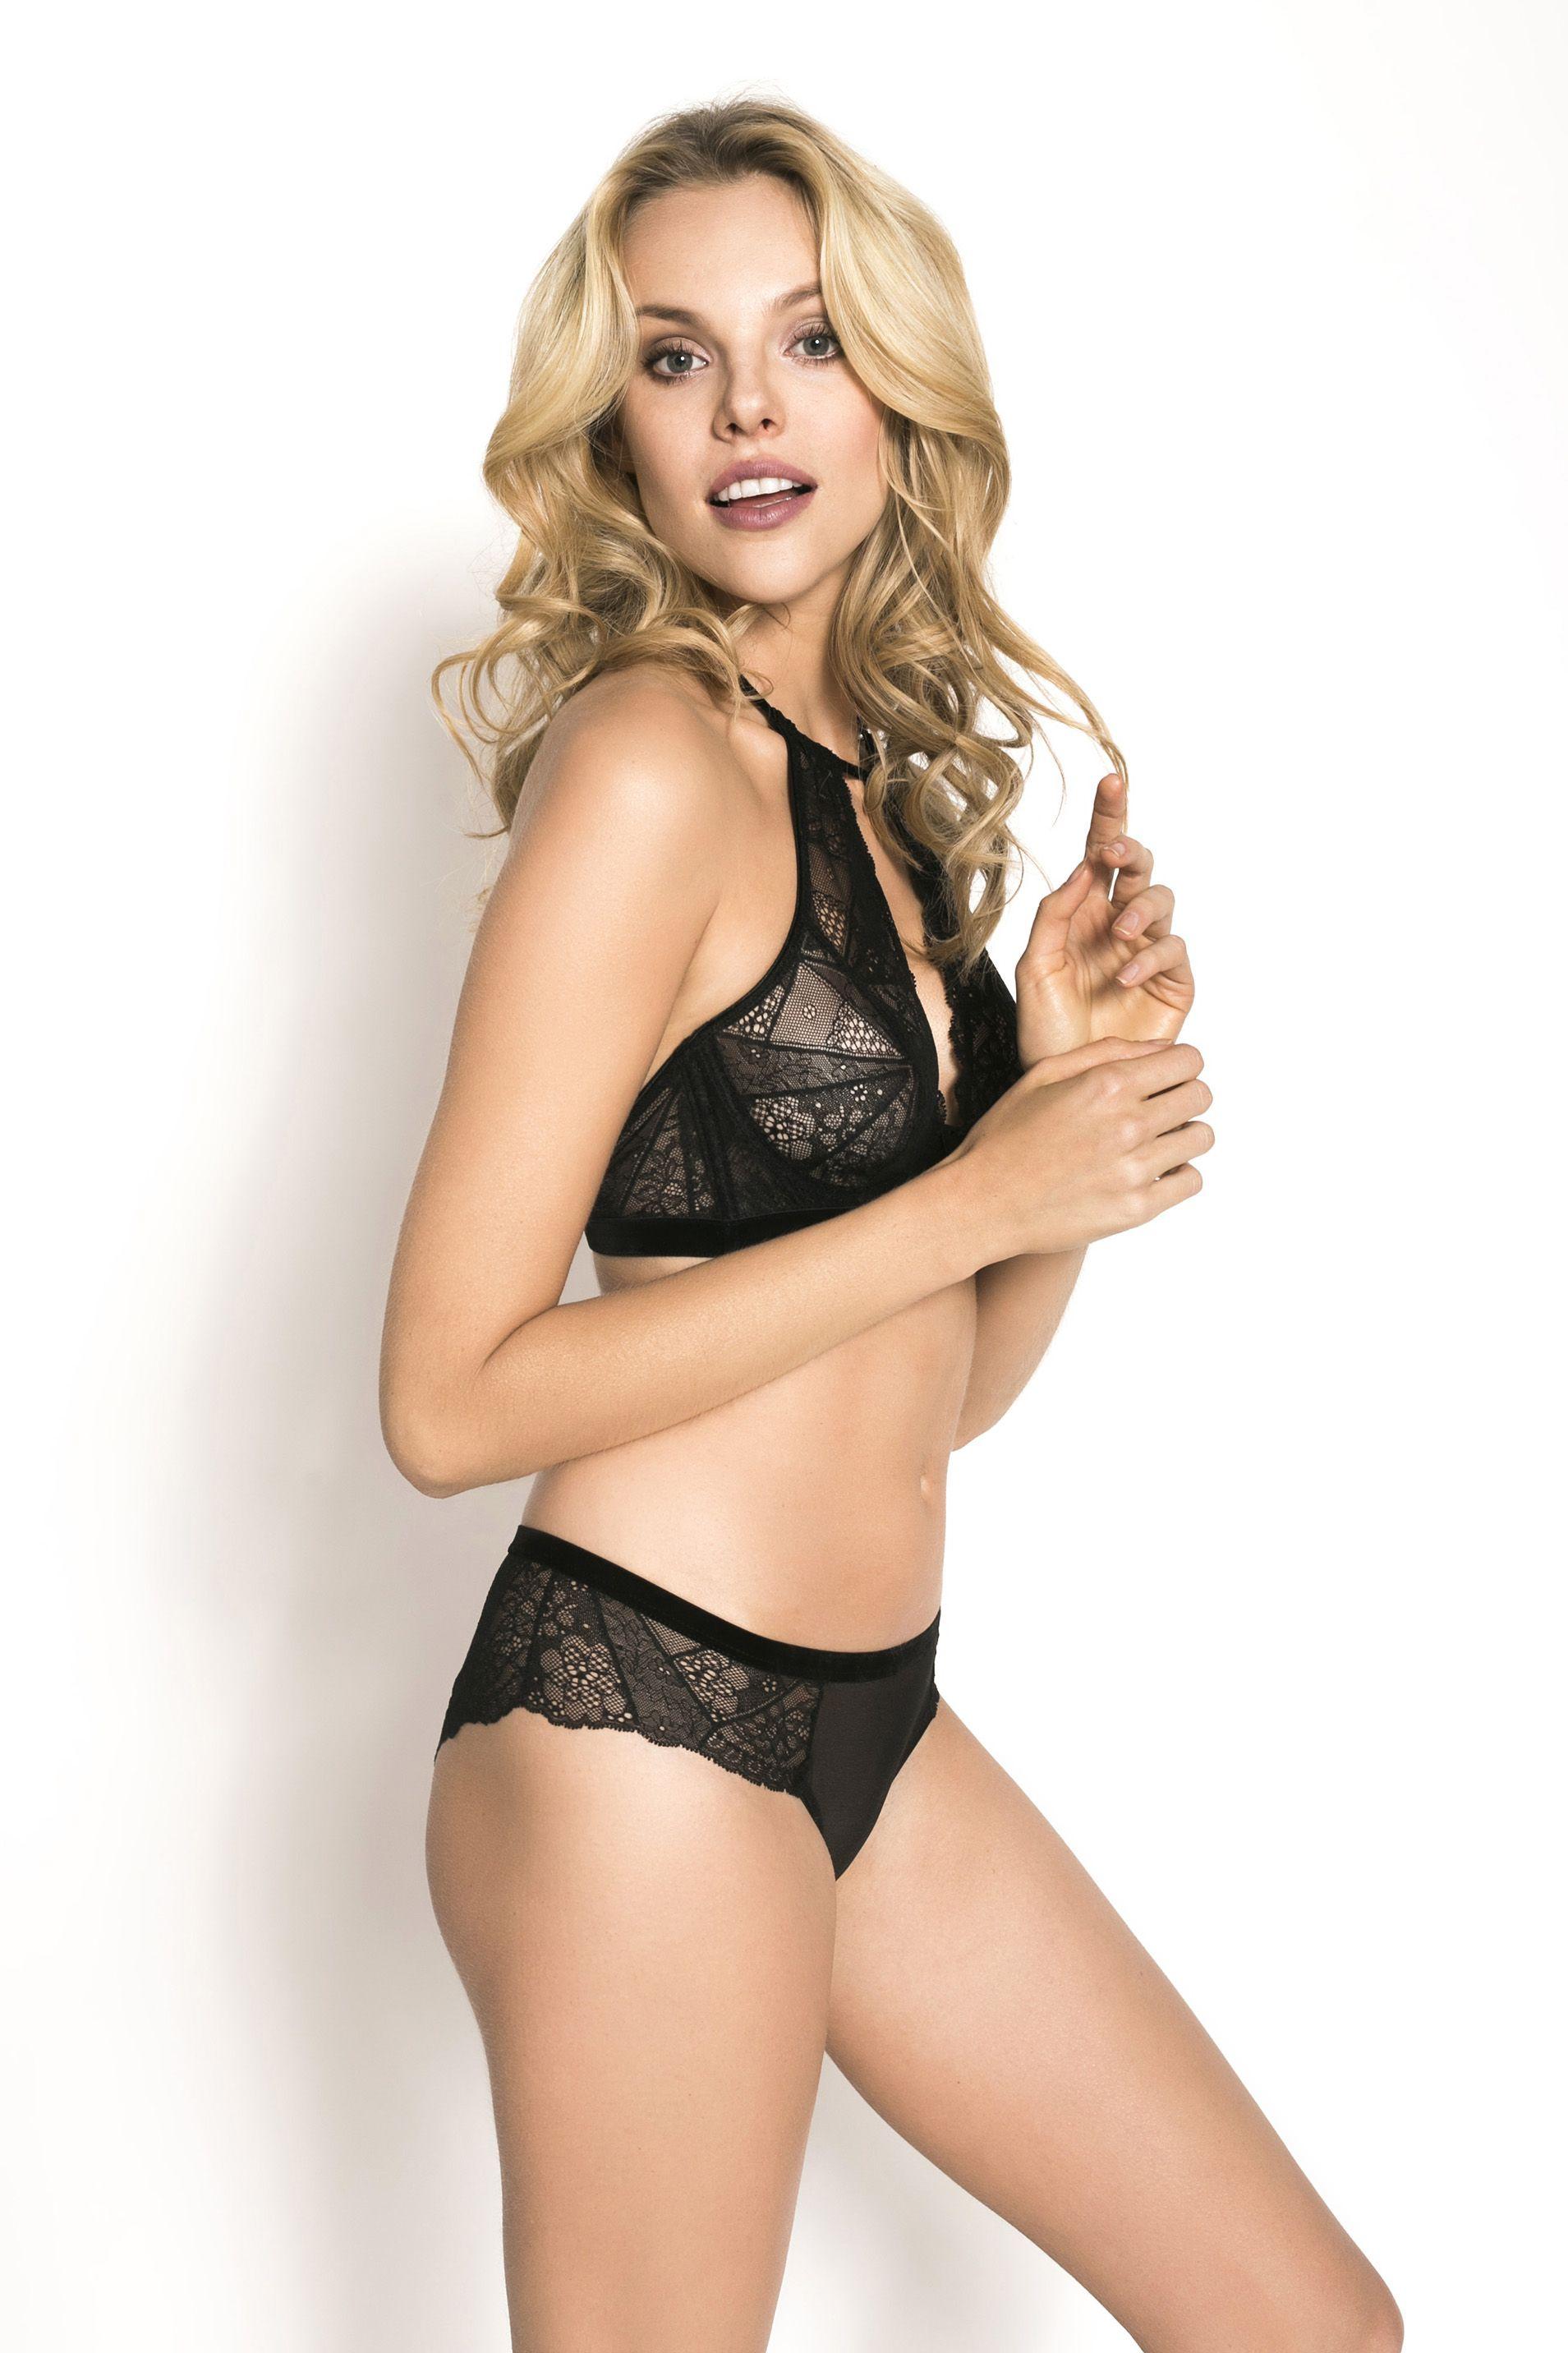 Buy Moda vero intimates lingerie summer lookbook picture trends